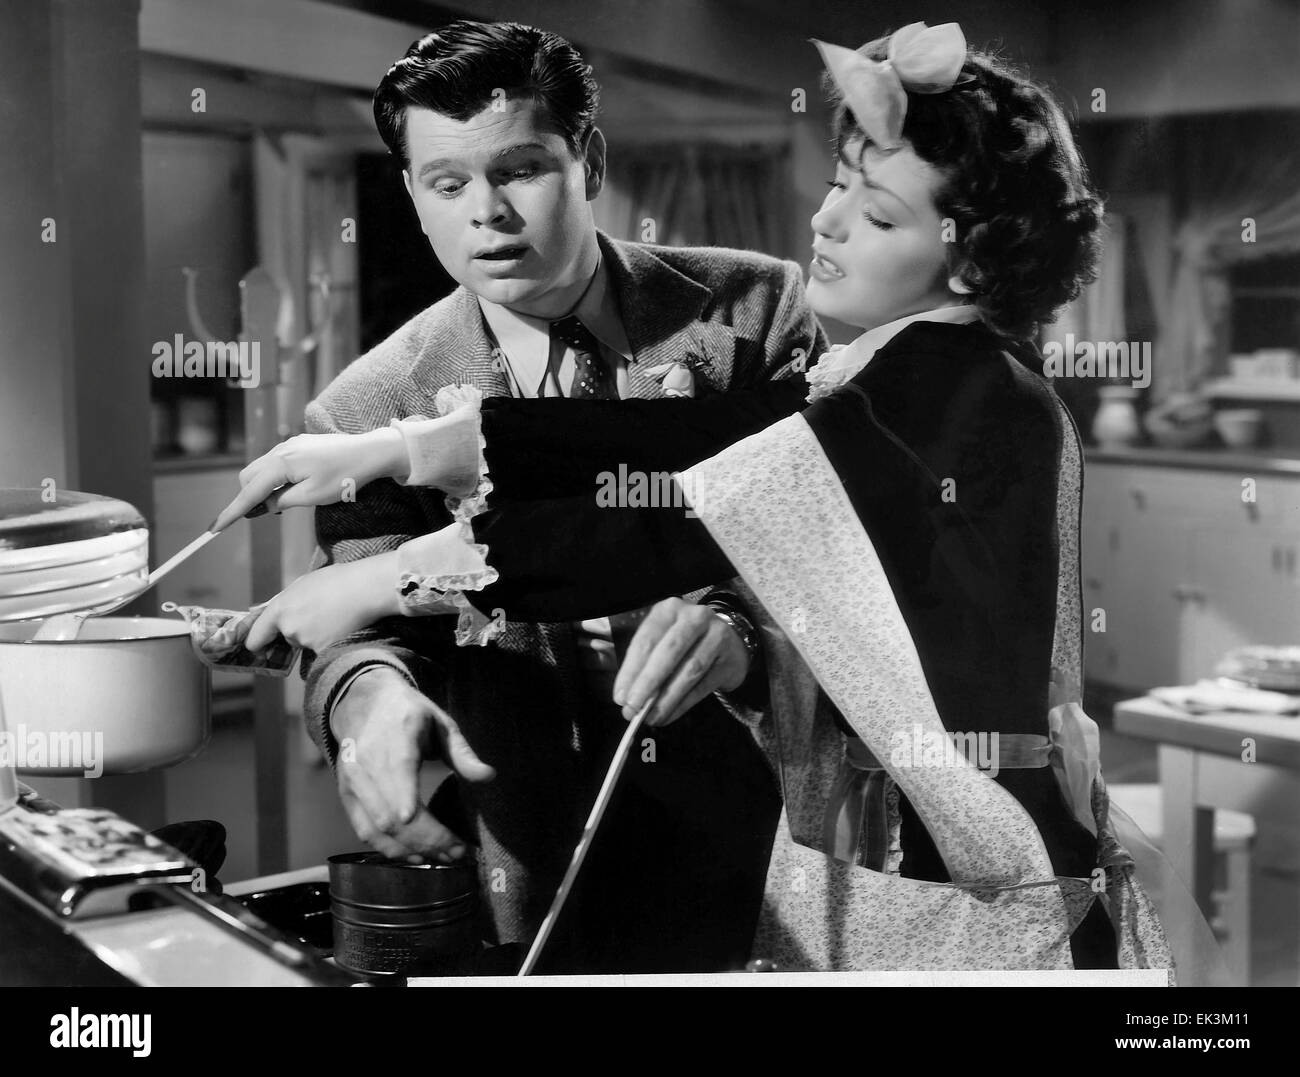 Barry Nelson, Marsha Hunt, on-set of the Film 'The Affairs of Martha', 1942 - Stock Image